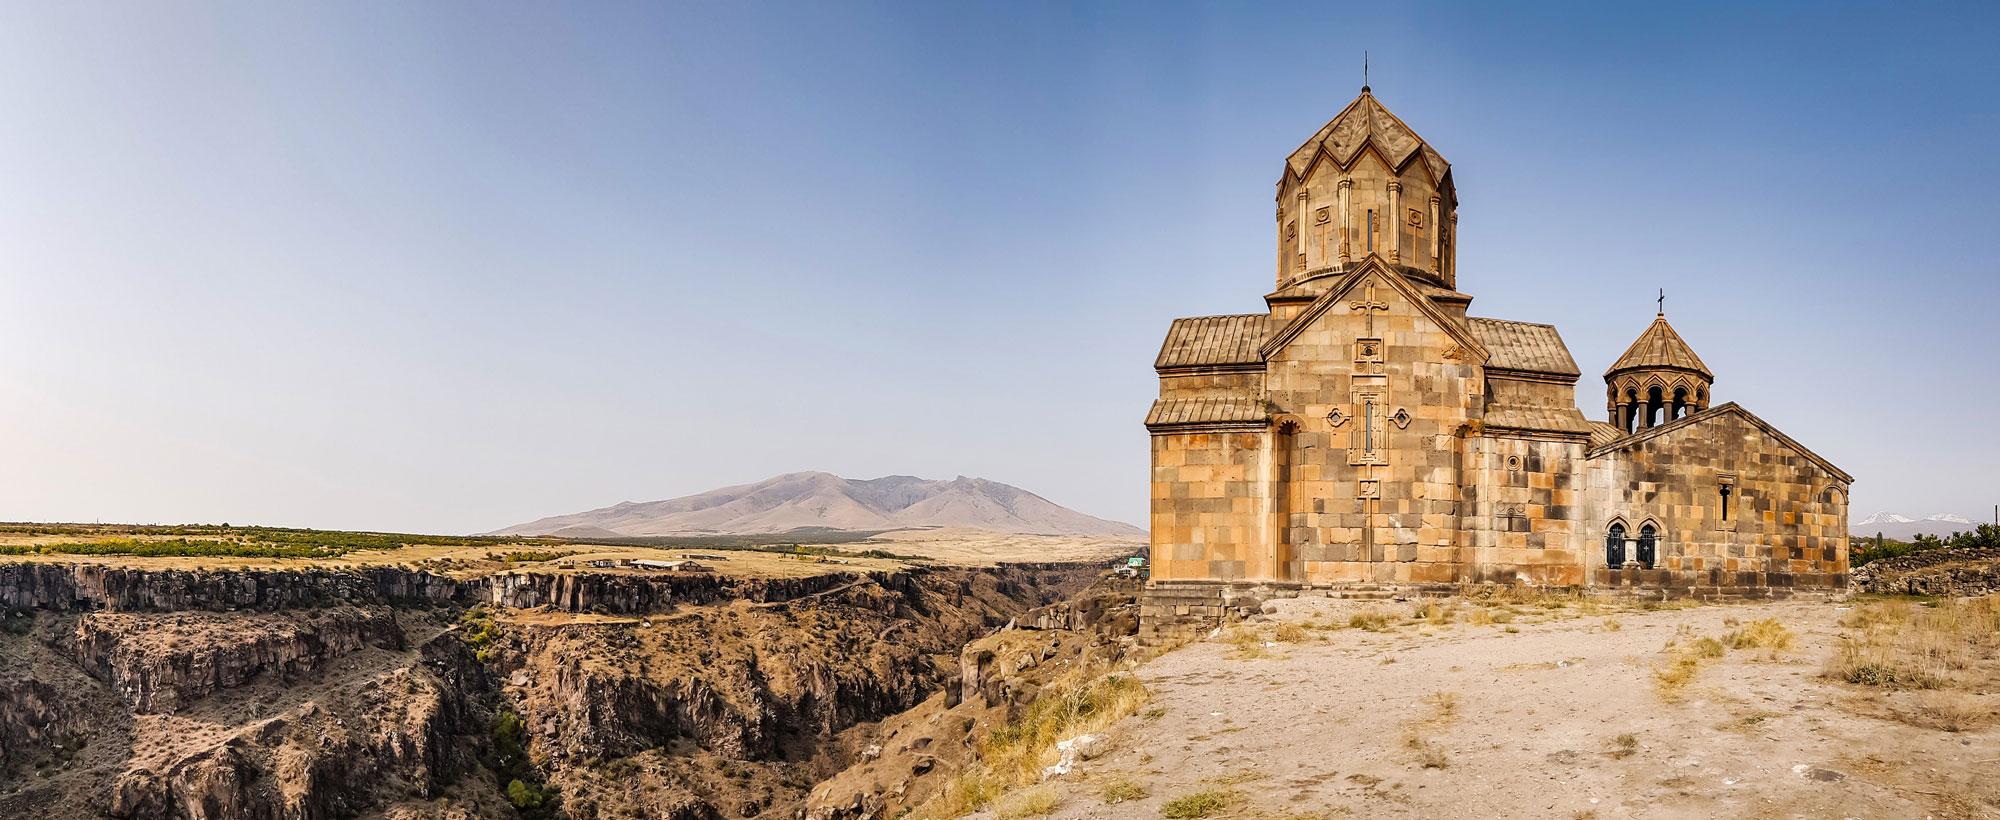 Armenia: objazdowe uroki kaukaskiej republiki © fot. Roman Stanek, Barents.pl